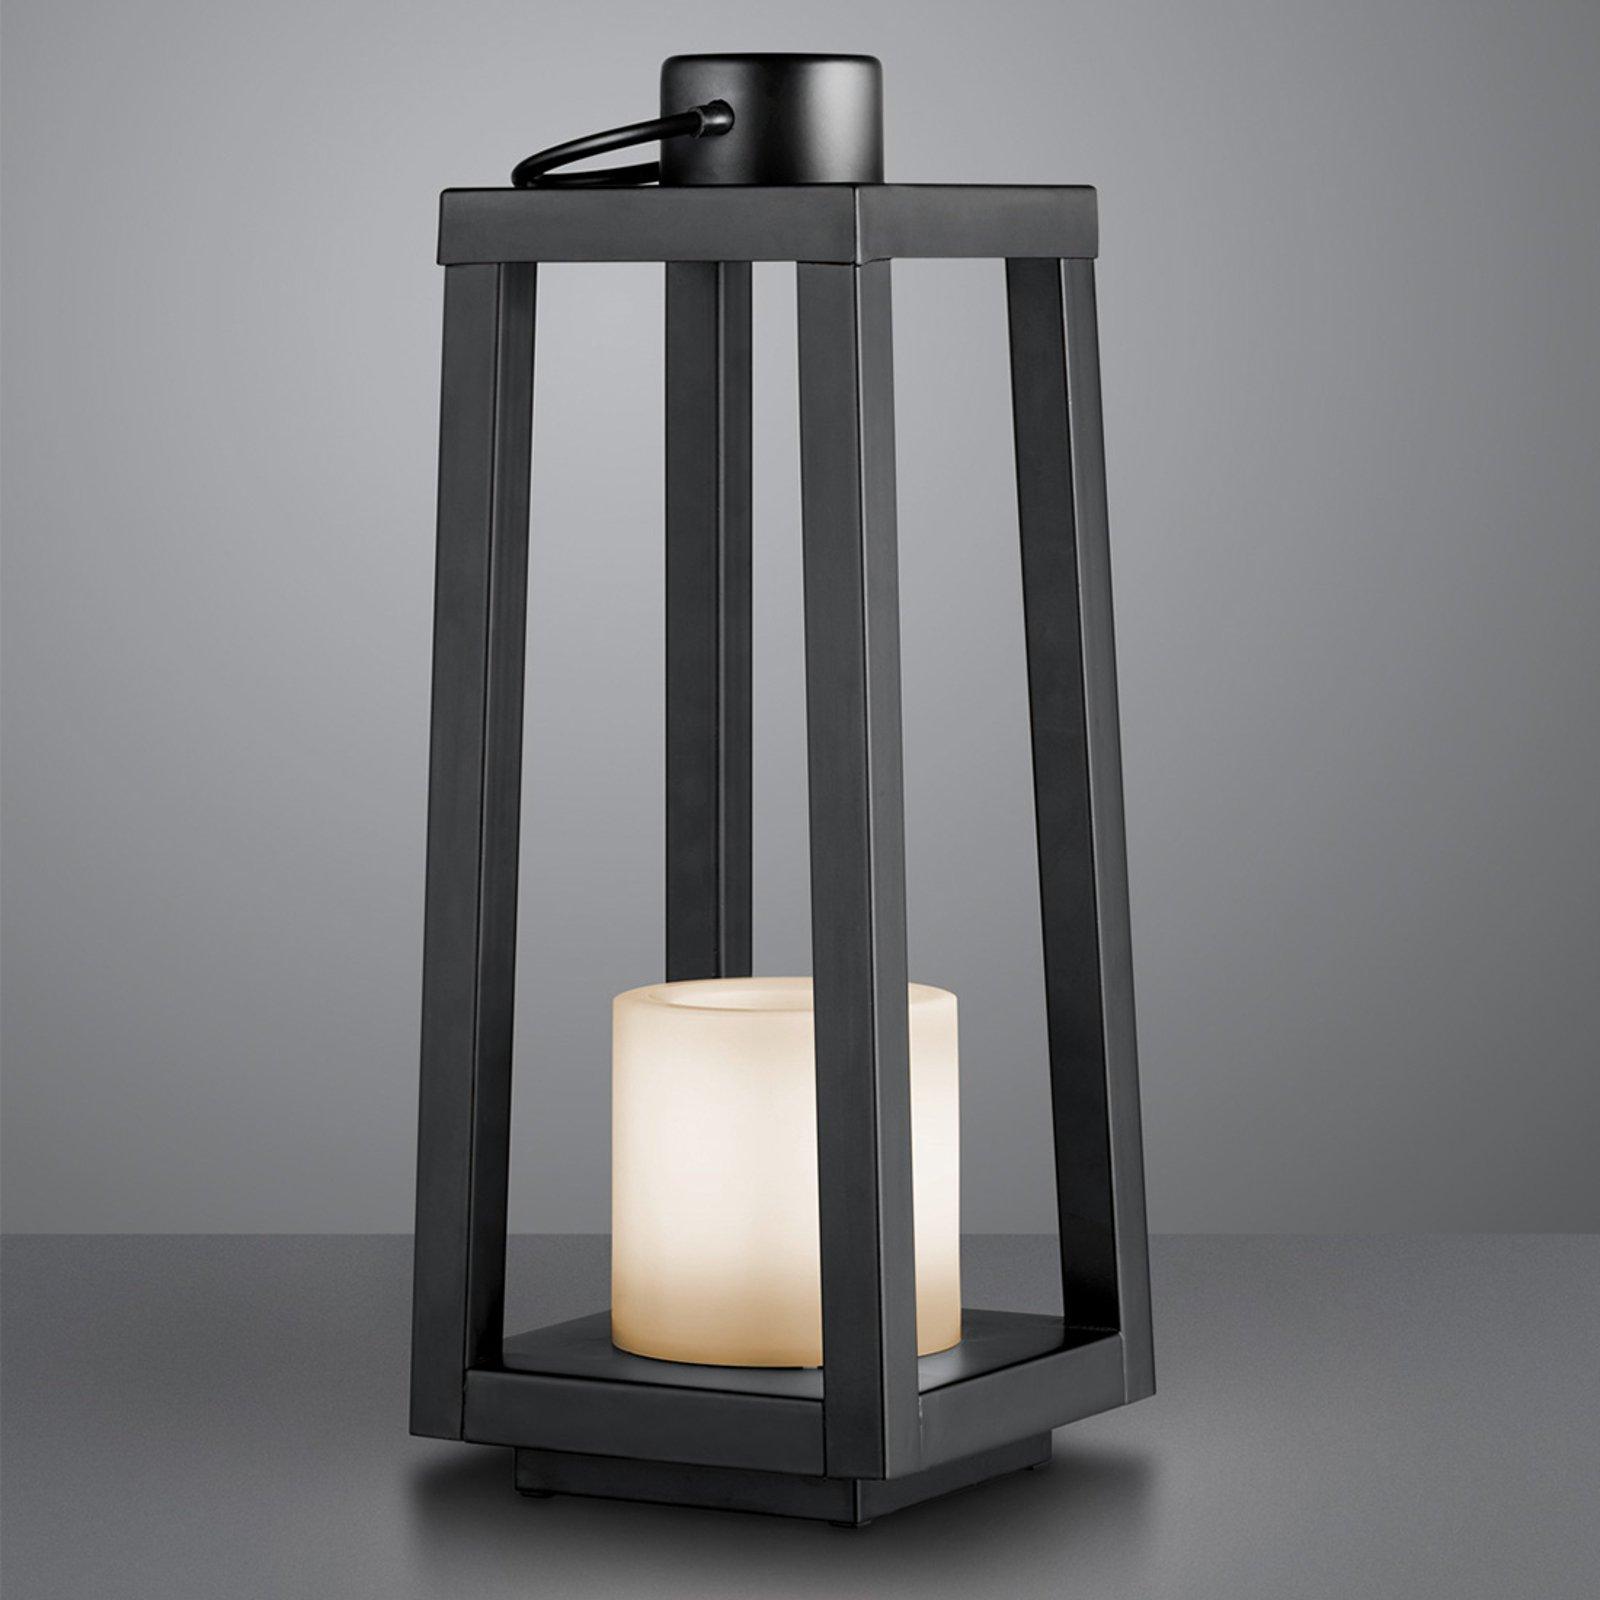 LED-sol-gulvlampe Loja med flammeeffekt